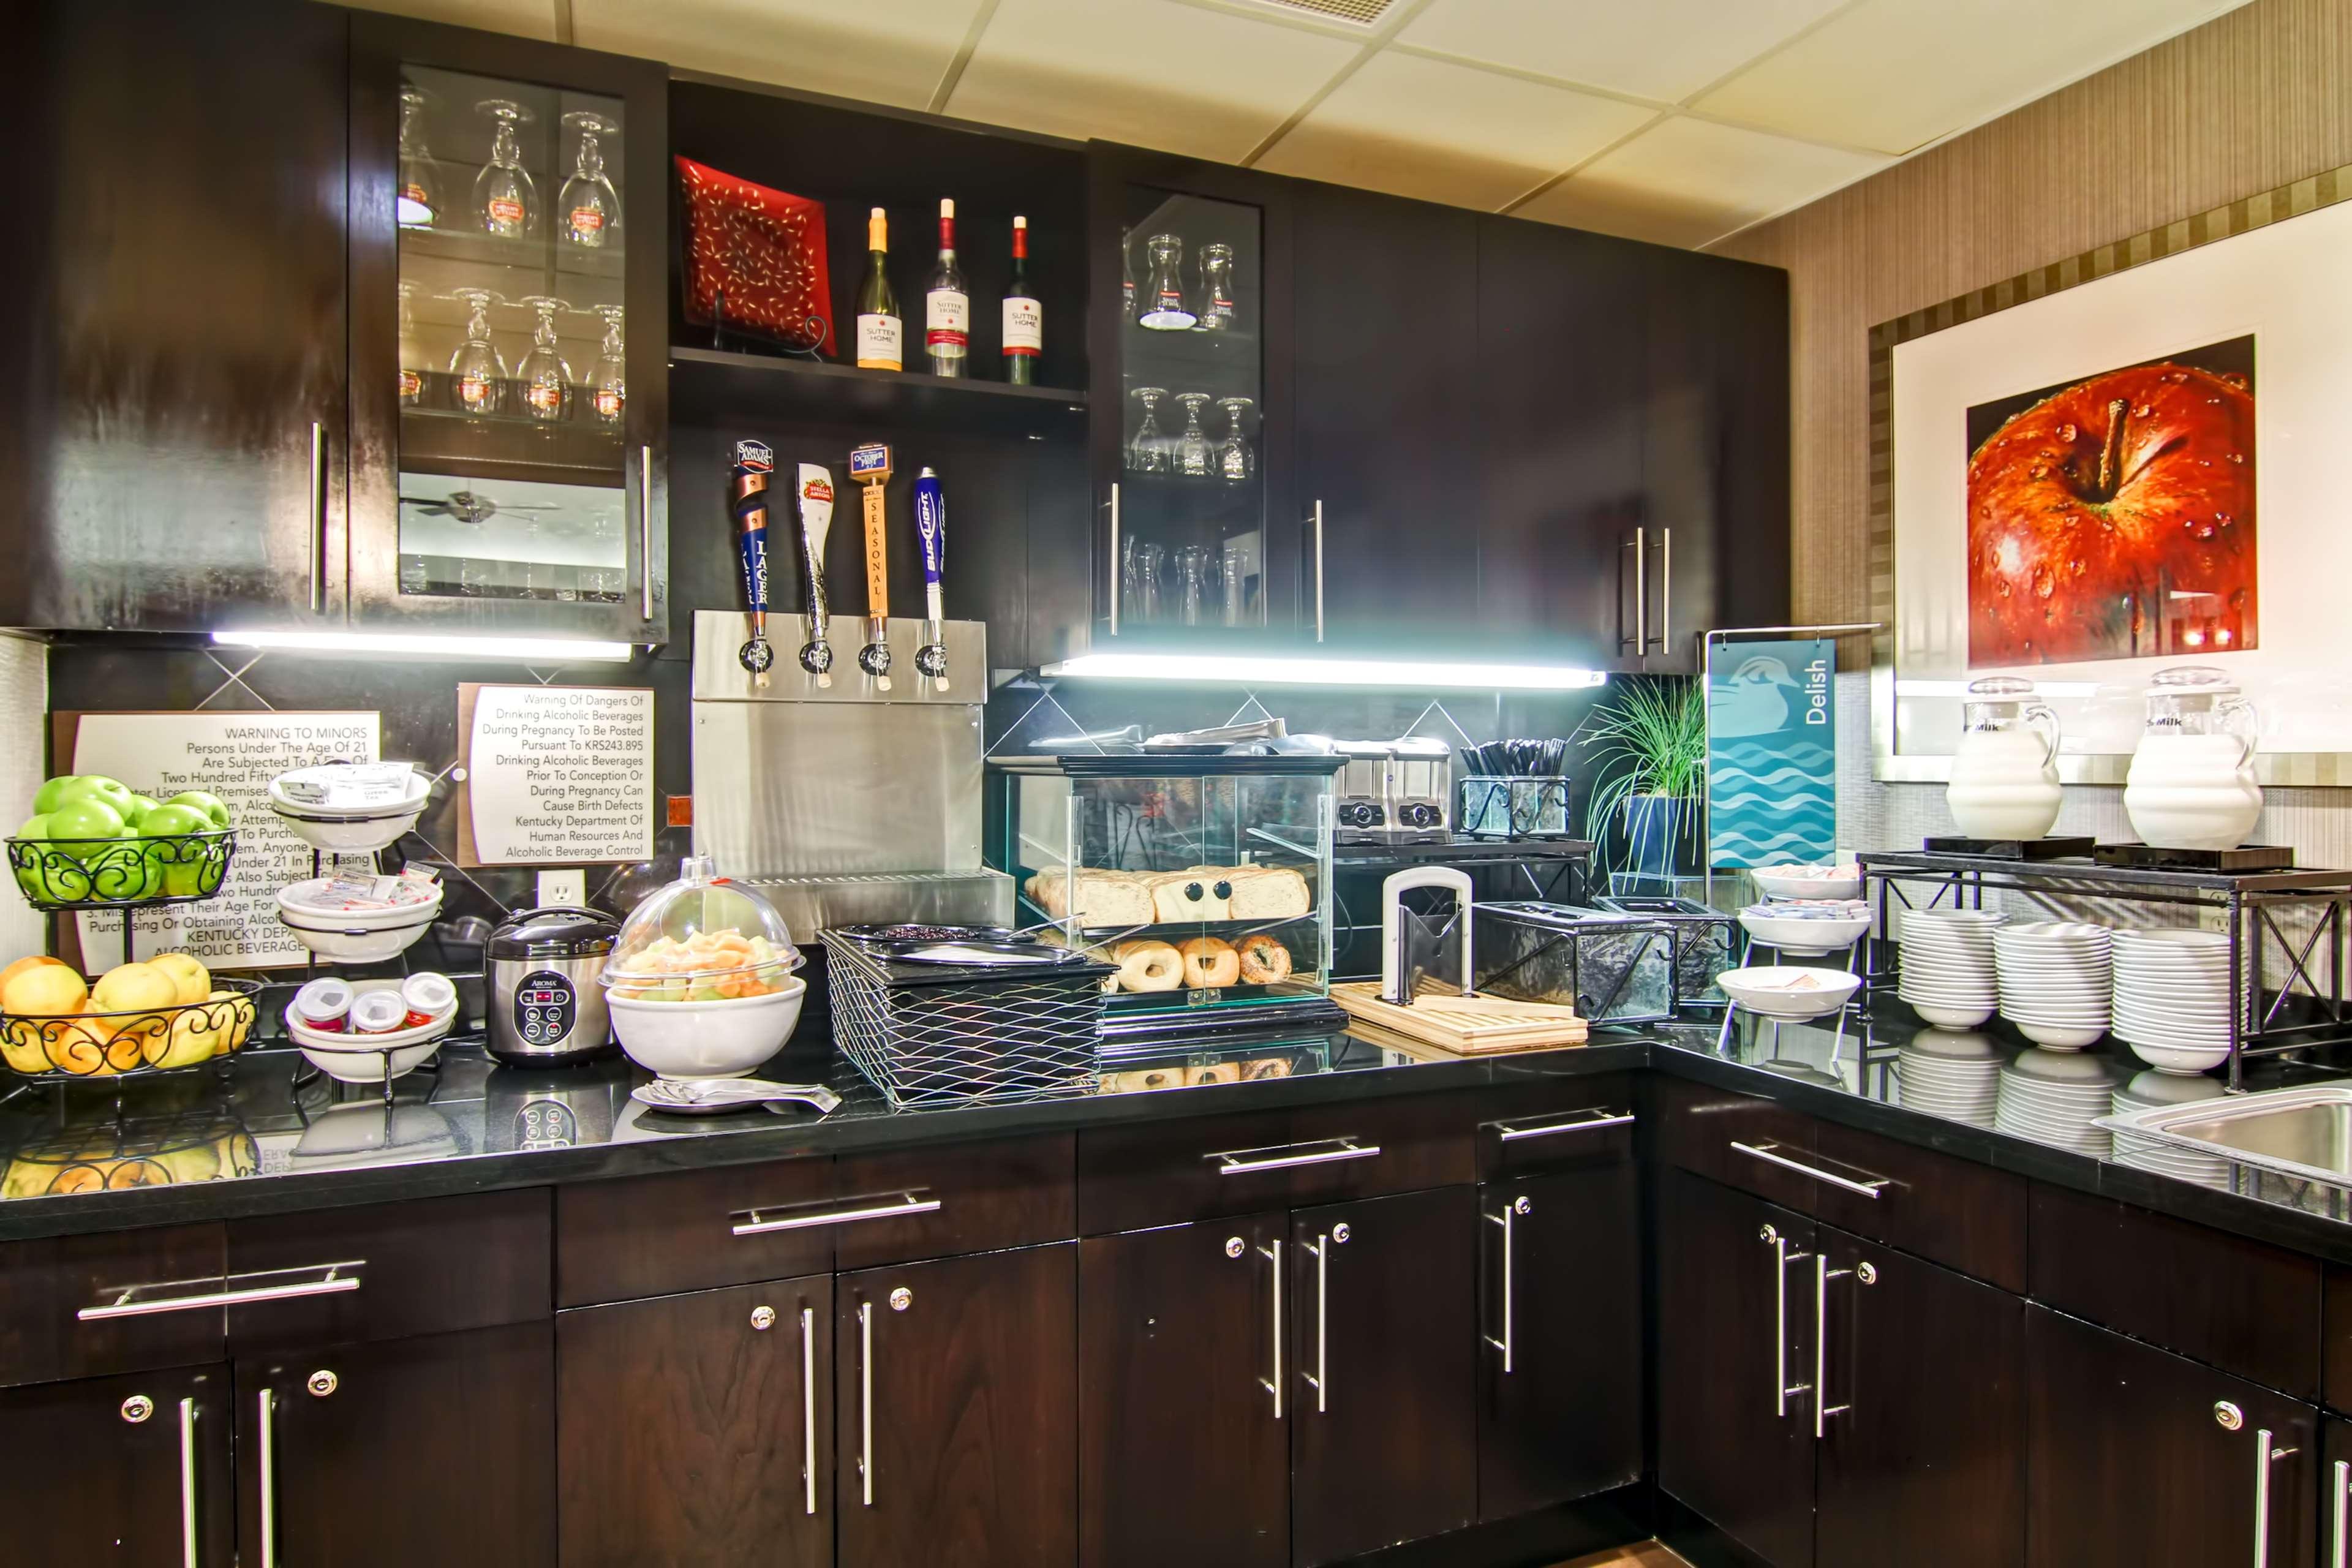 Homewood Suites by Hilton Cincinnati Airport South-Florence image 7